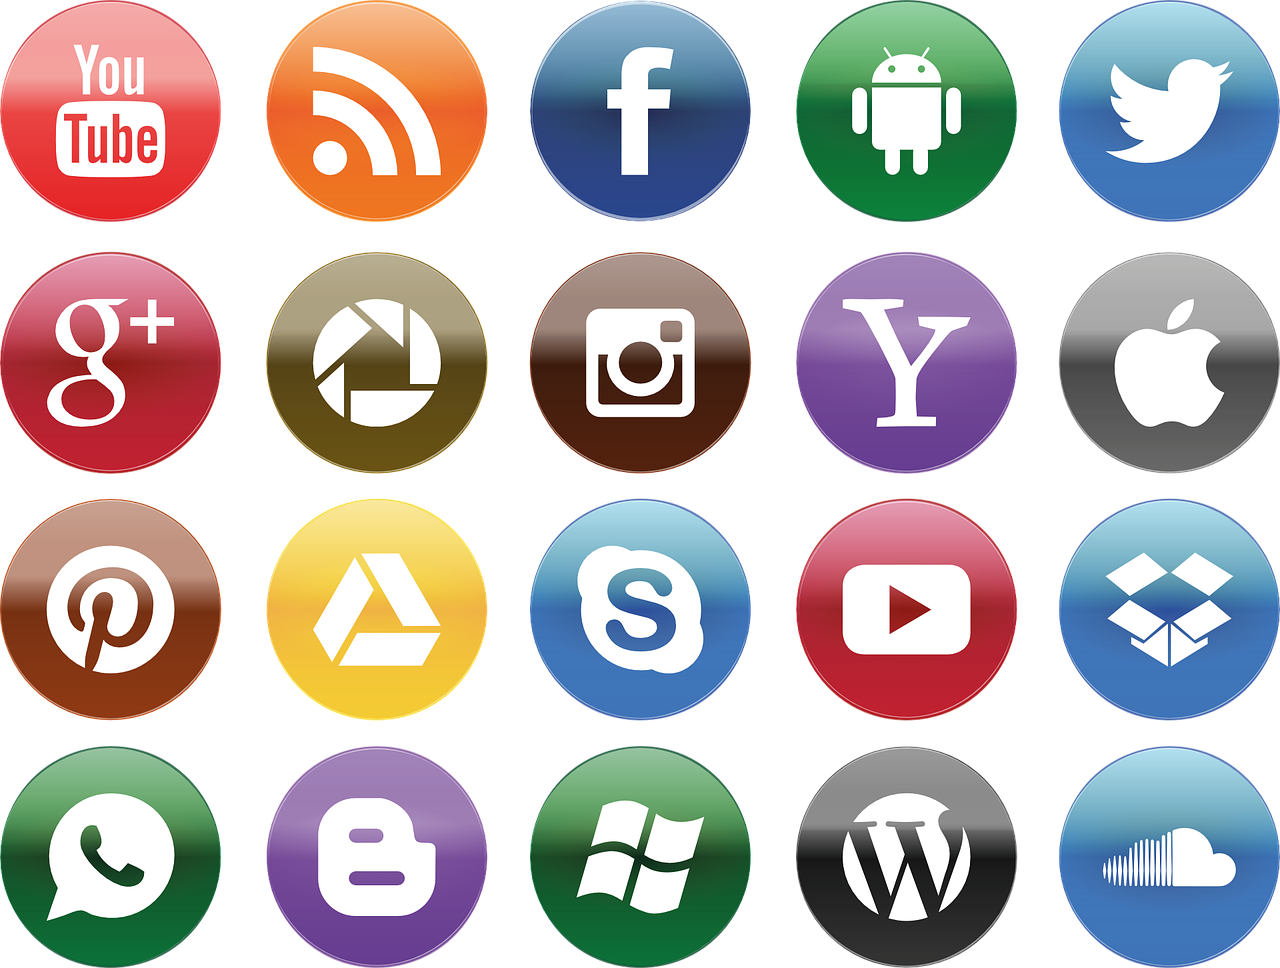 Création d'un site Internet Niort avec WordPress